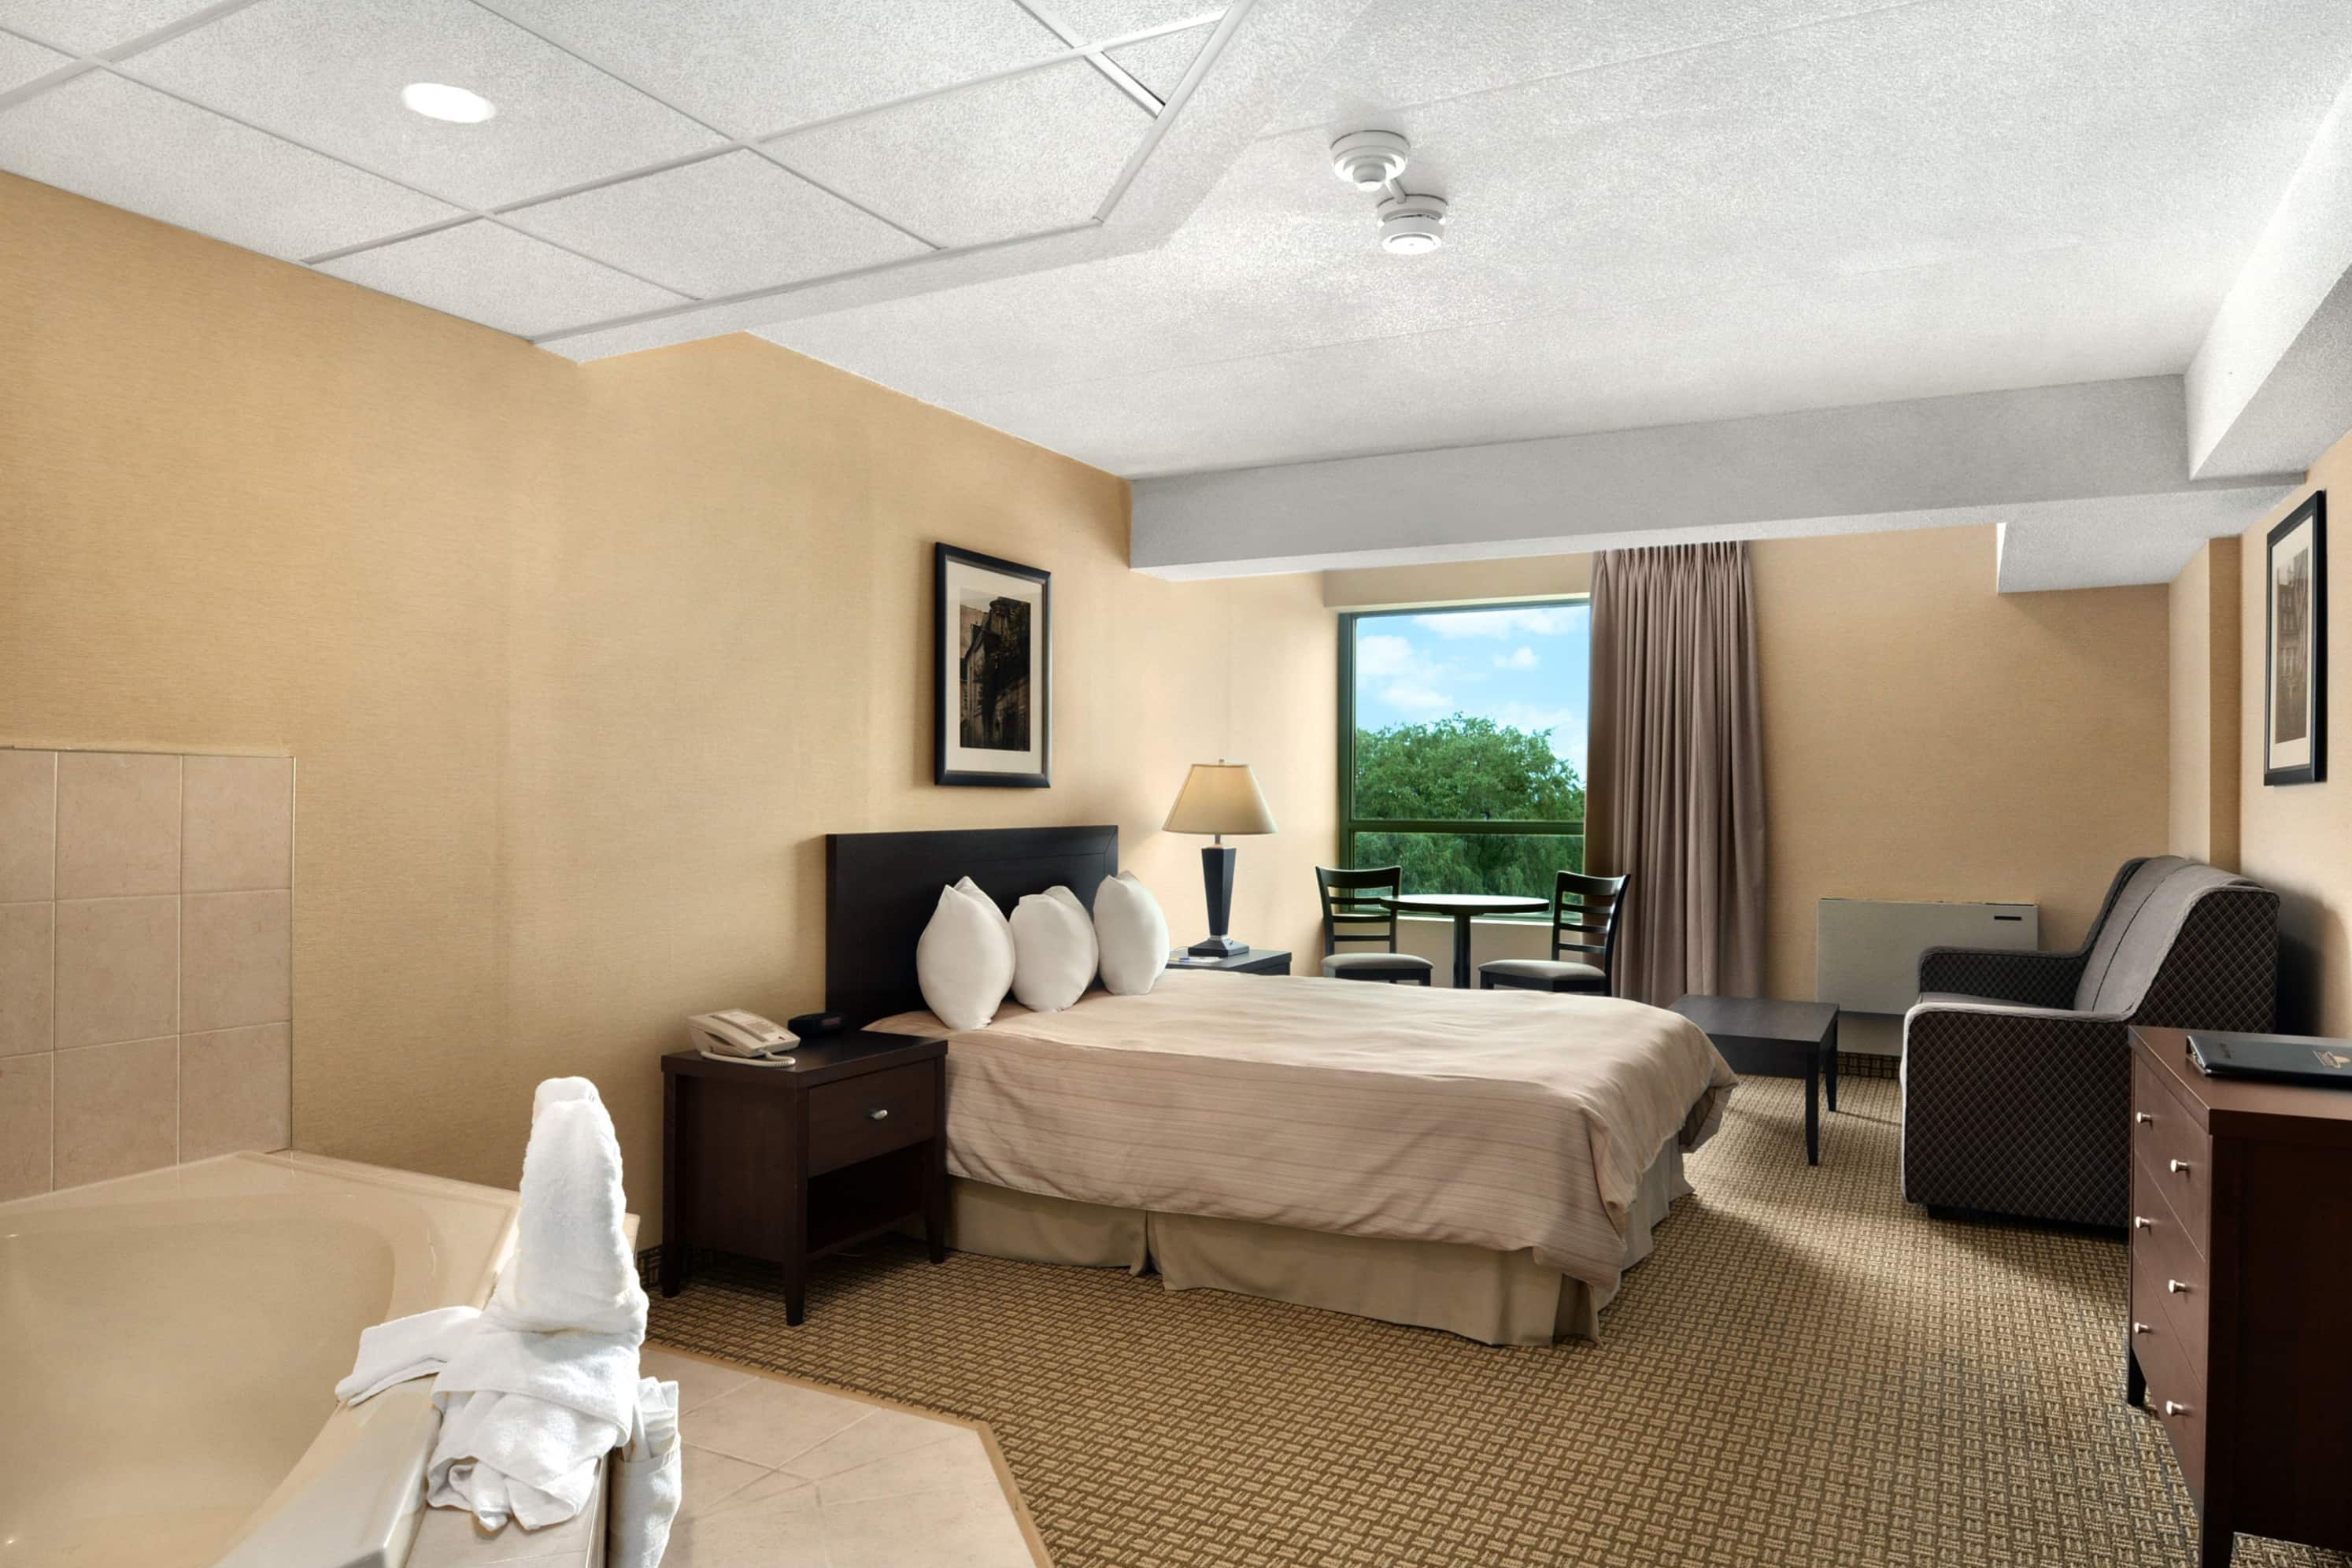 Days Inn - Niagara Falls Lundys Lane suite in Niagara Falls, Ontario